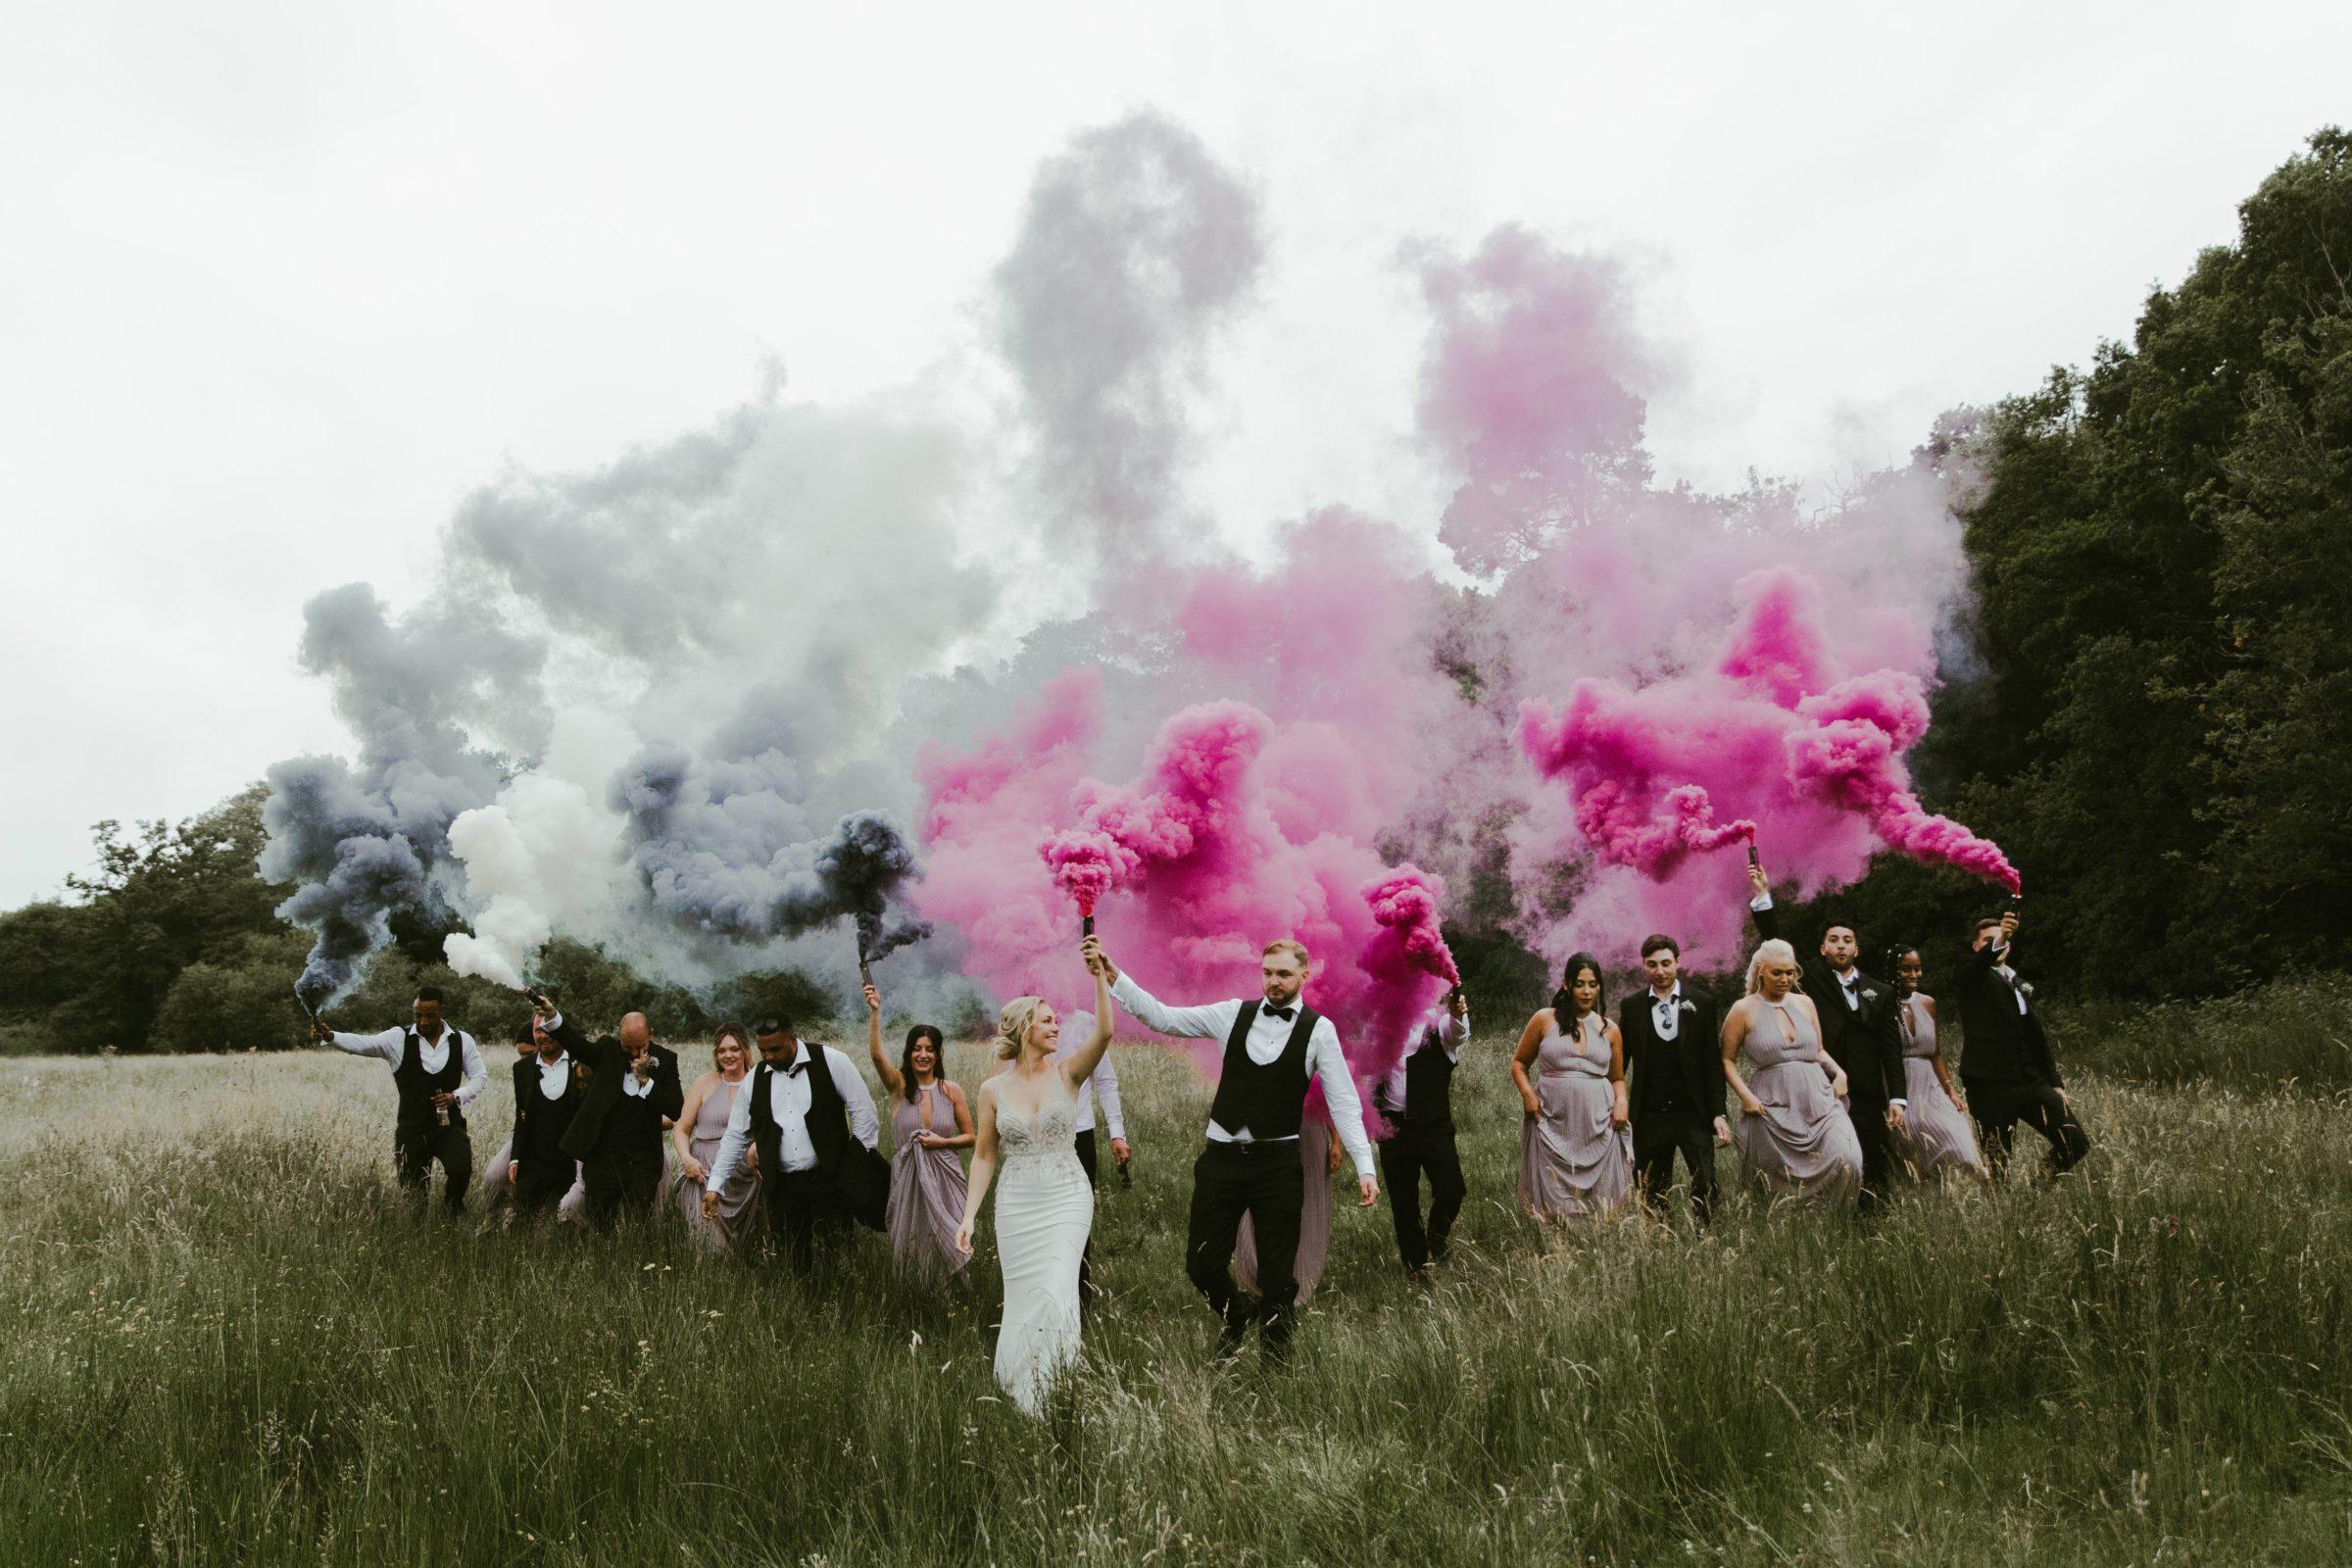 millbridge-court-wedding-venue-frensham-farnham-surrey-uk-photography-photographer-bridal-party-smoke-bombs-flares-fun